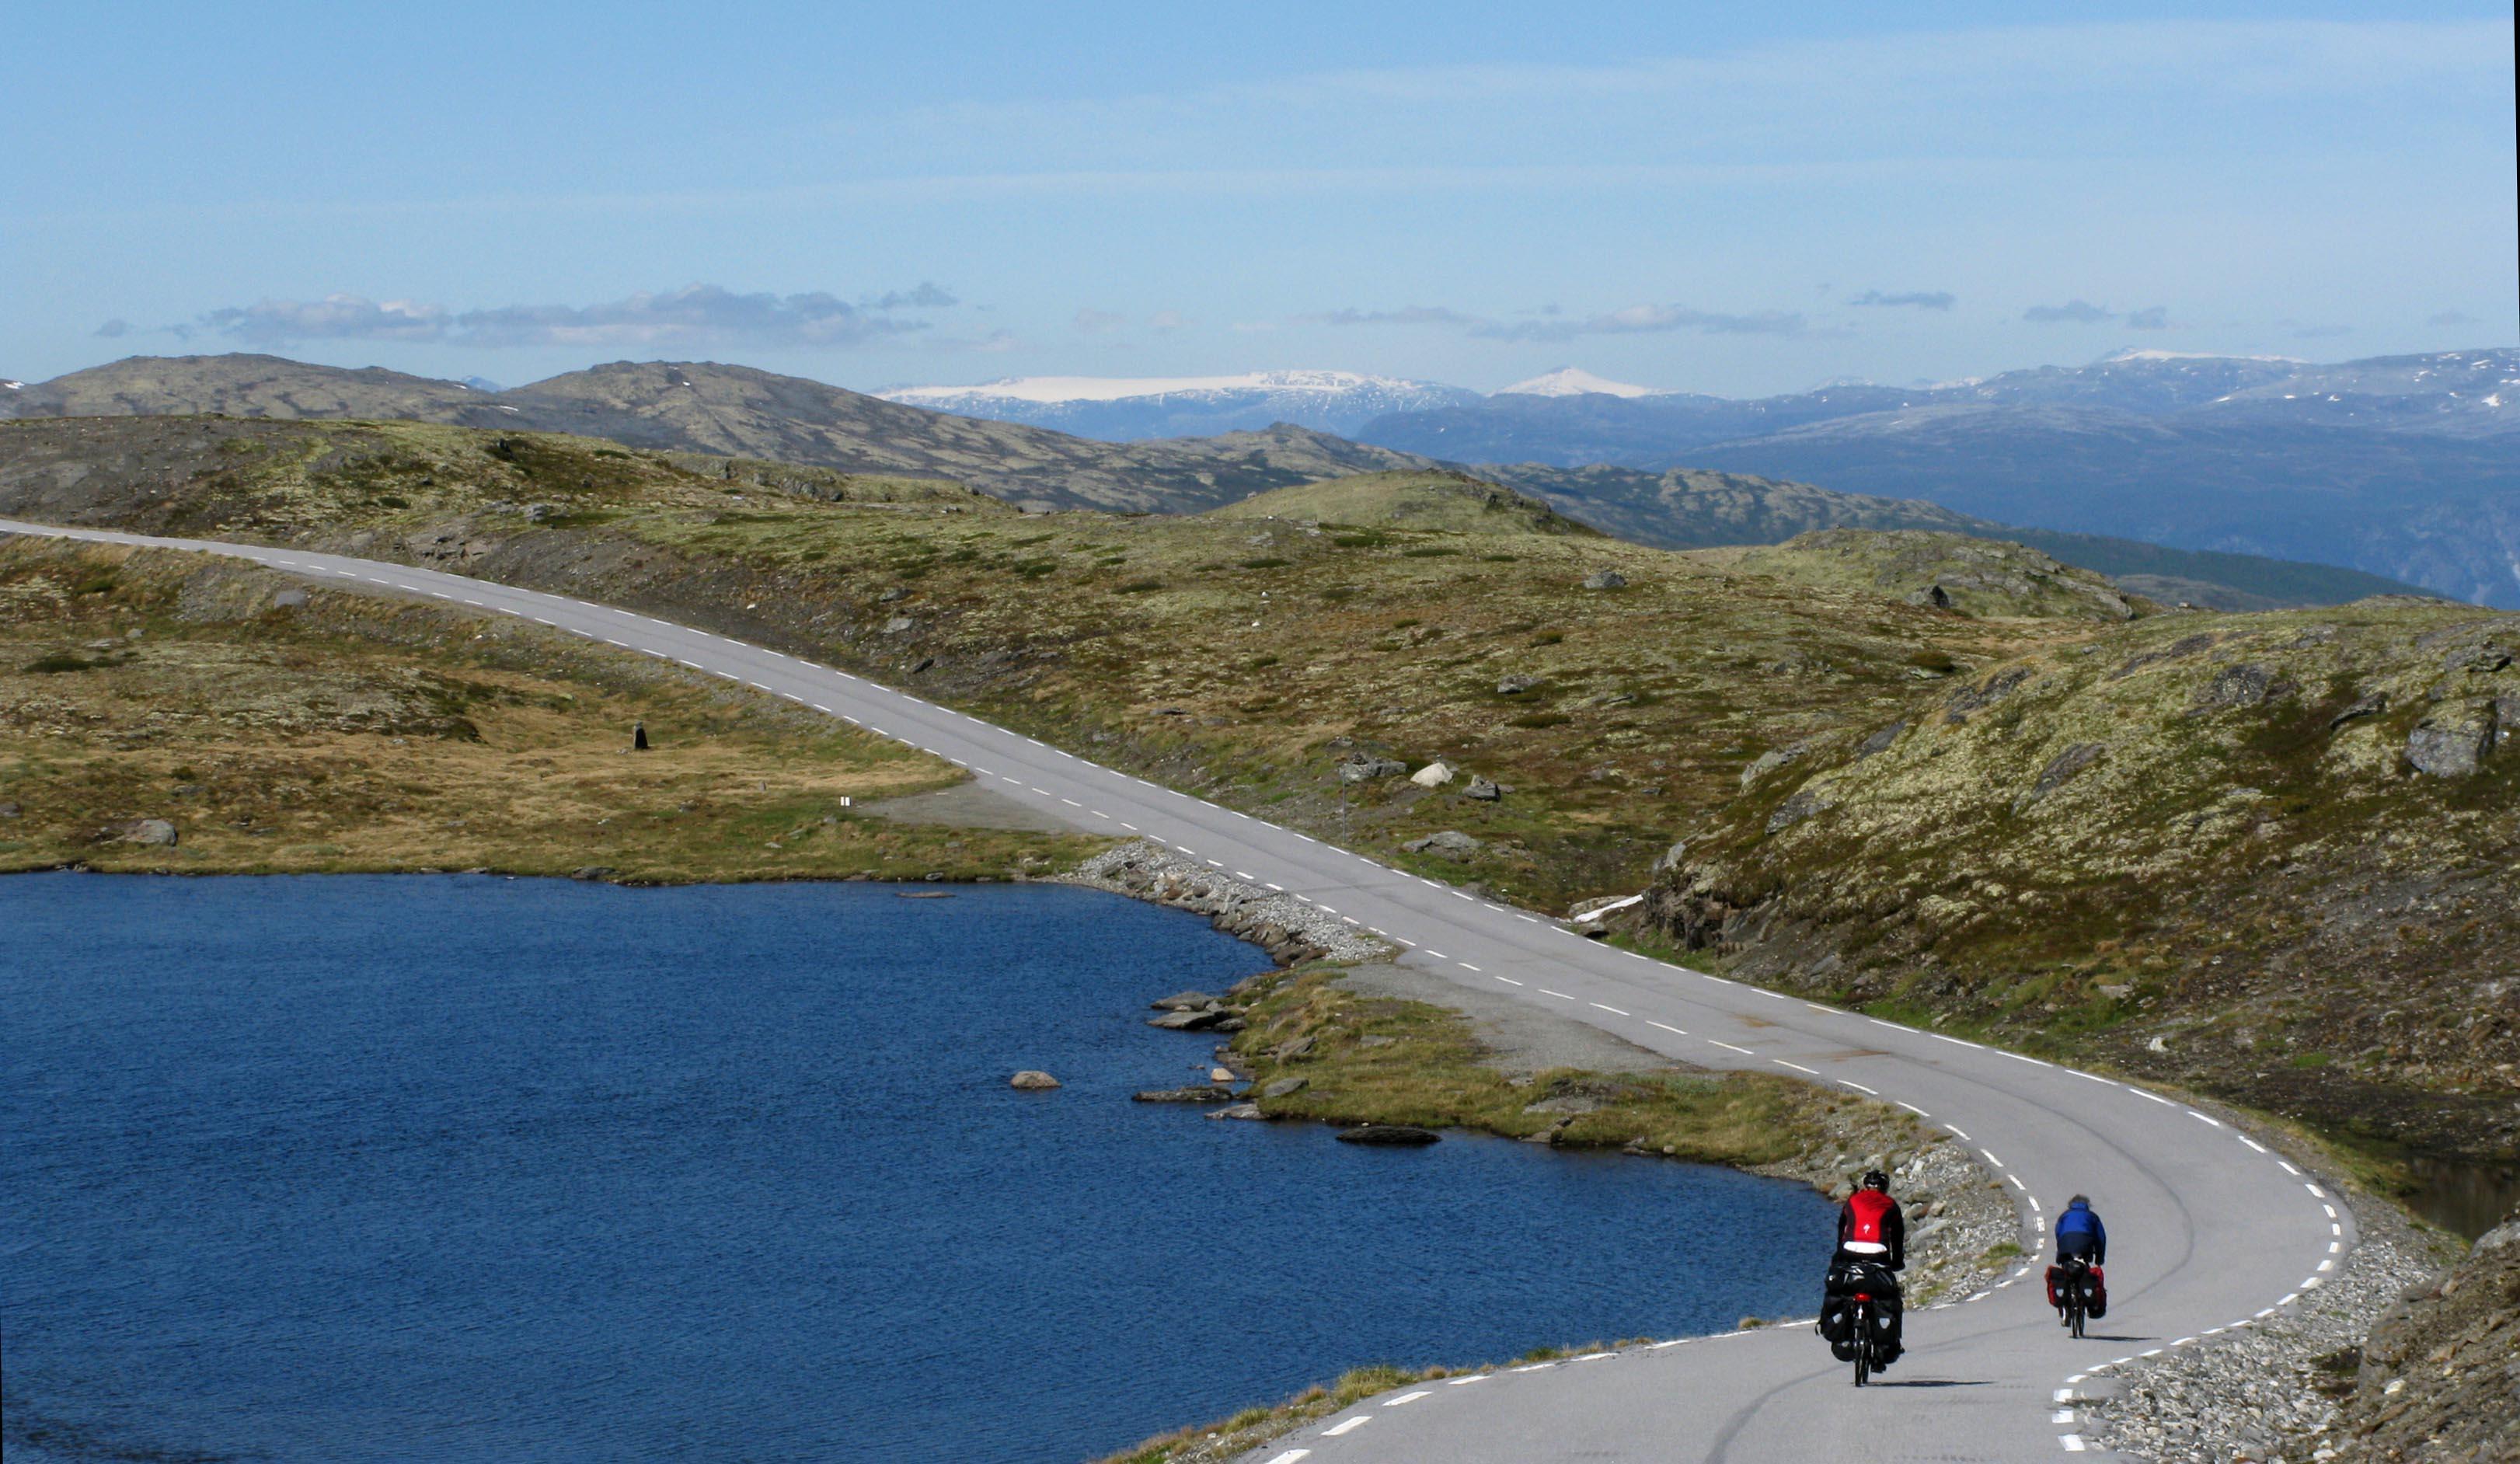 norwegen-radfahrer-fjellstrasse